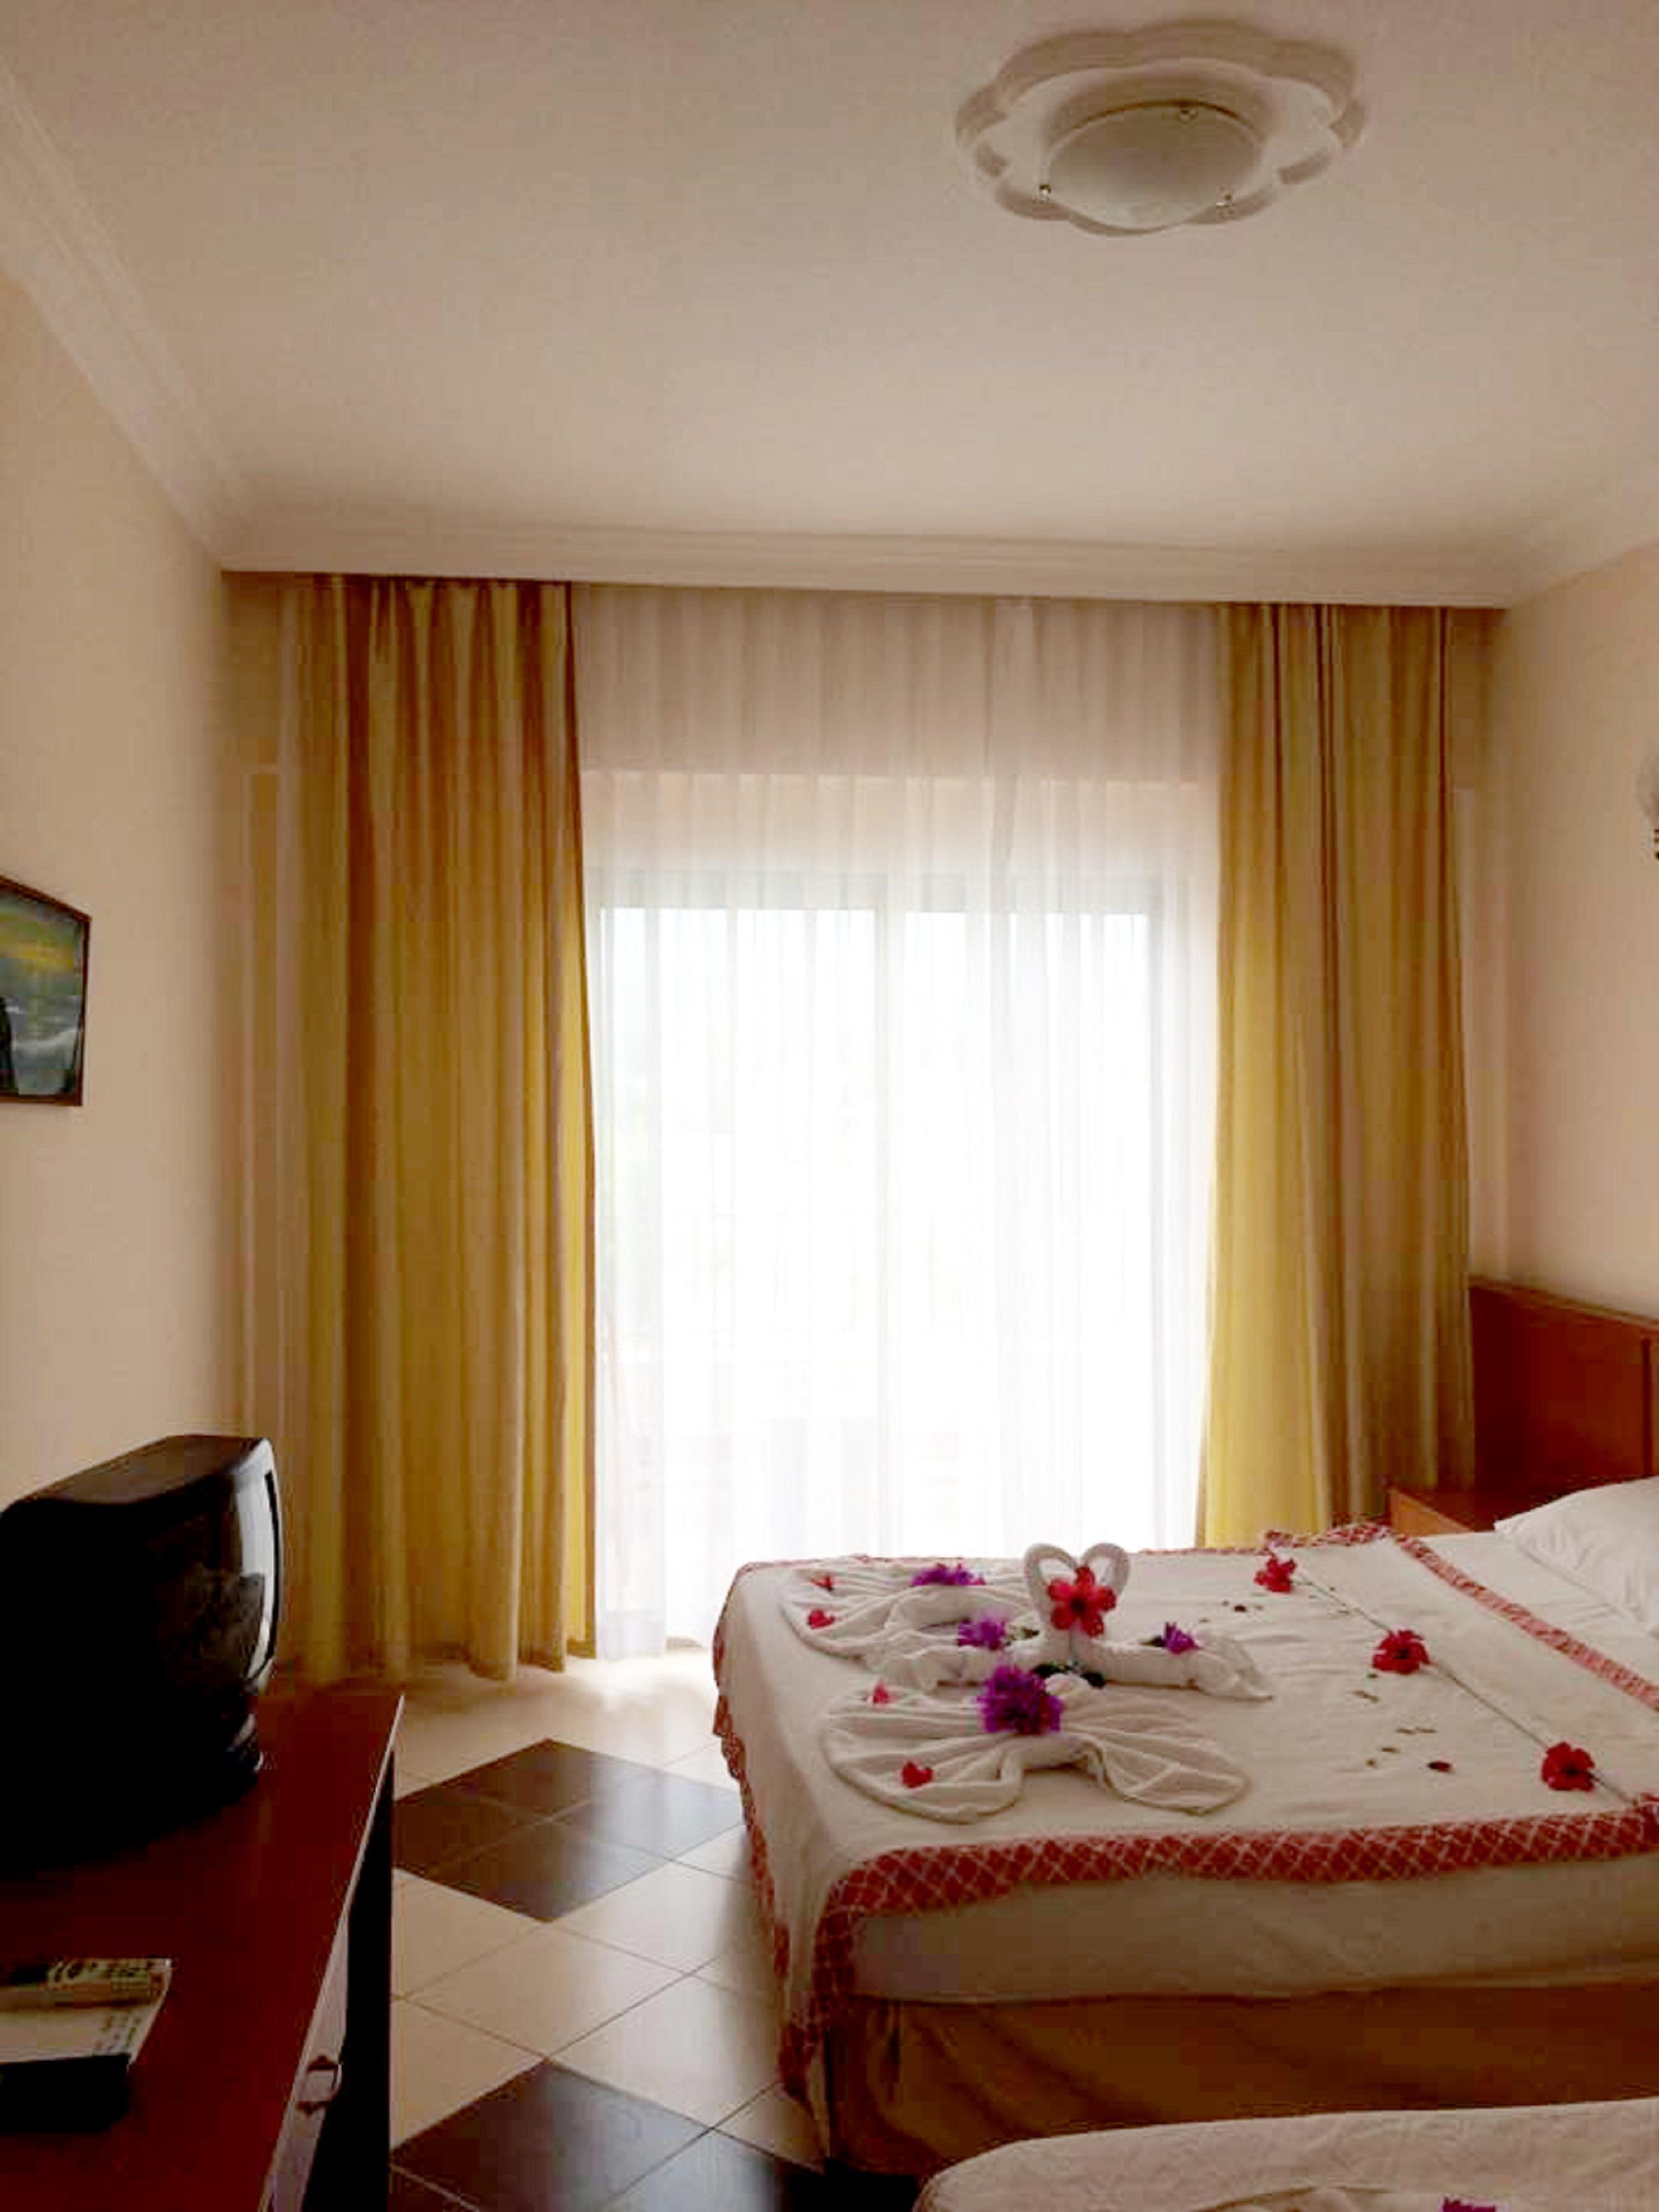 ISTANBUL BEACH HOTEL